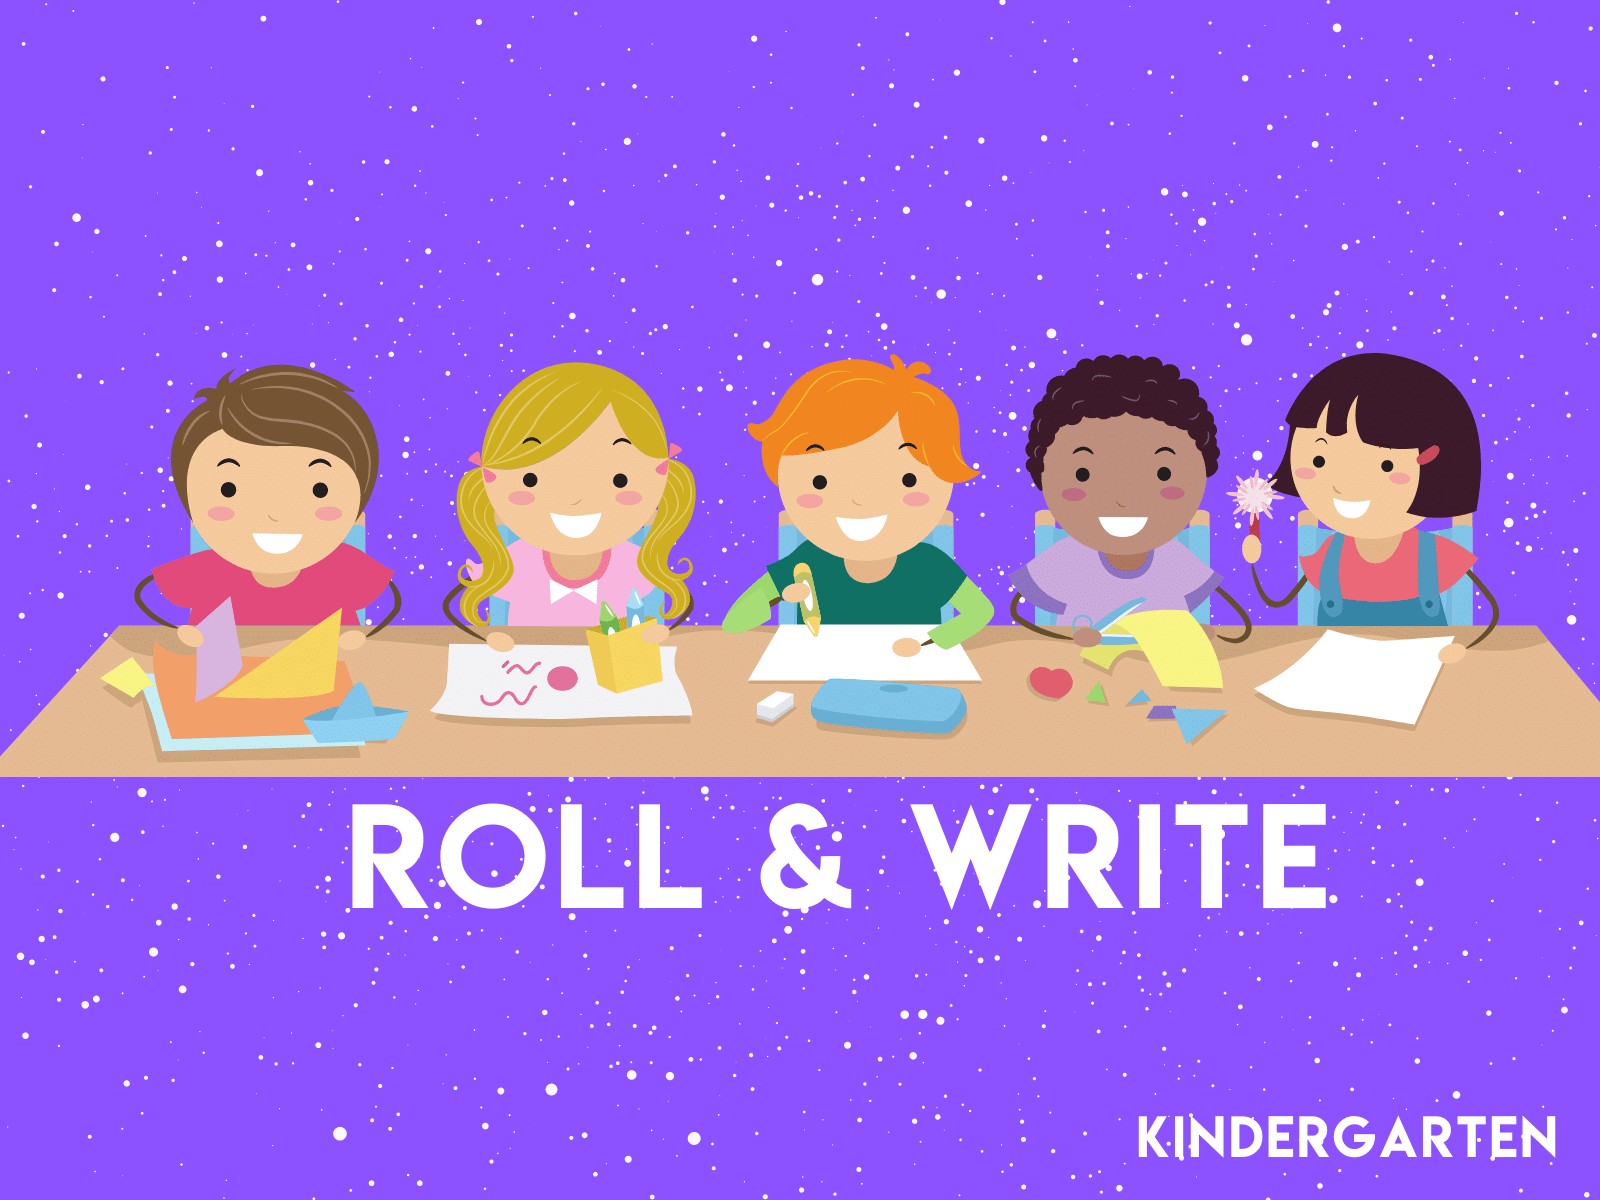 Kindergarten Roll and Write